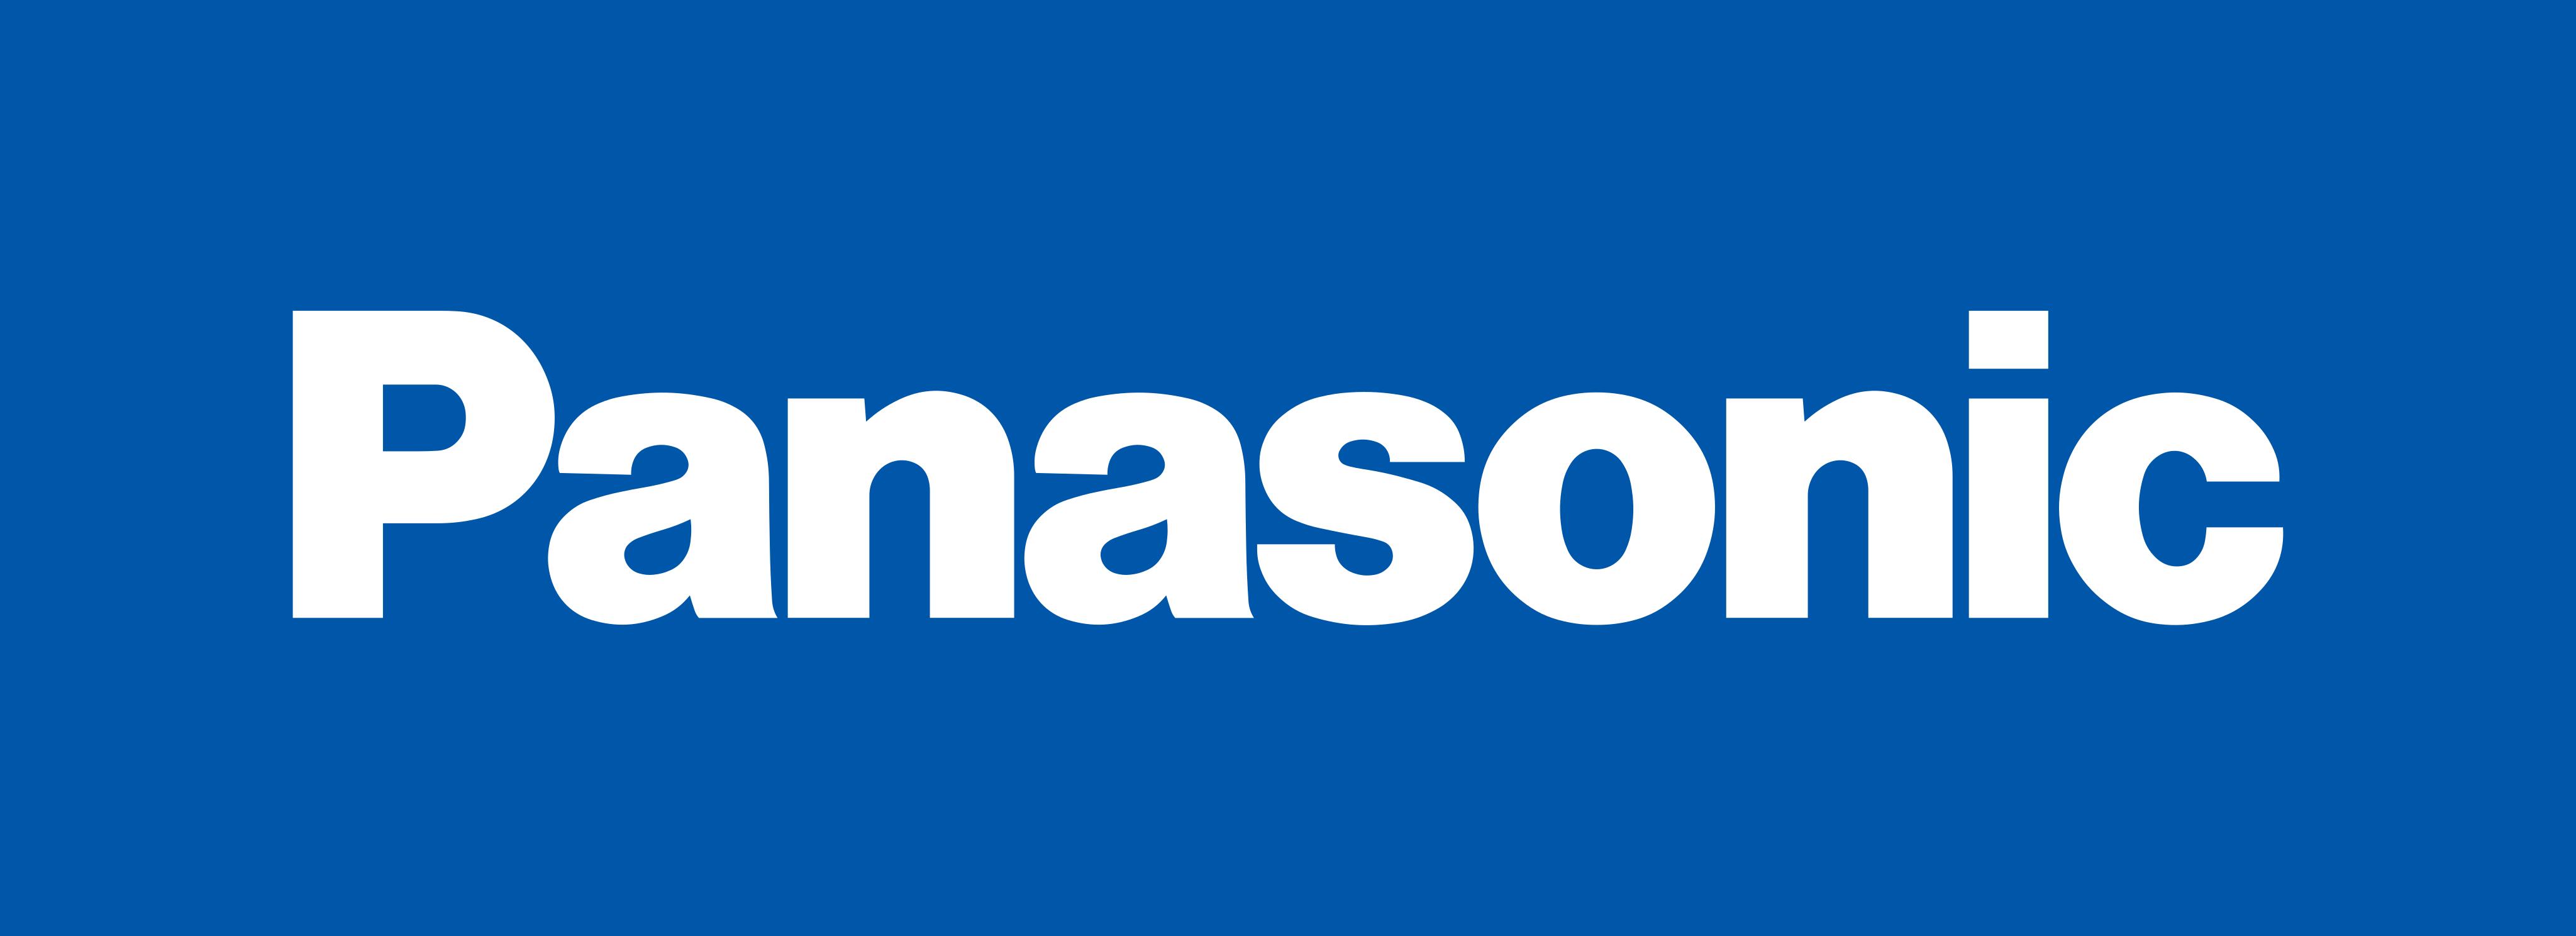 panasonic logo 1 1 - Panasonic Logo